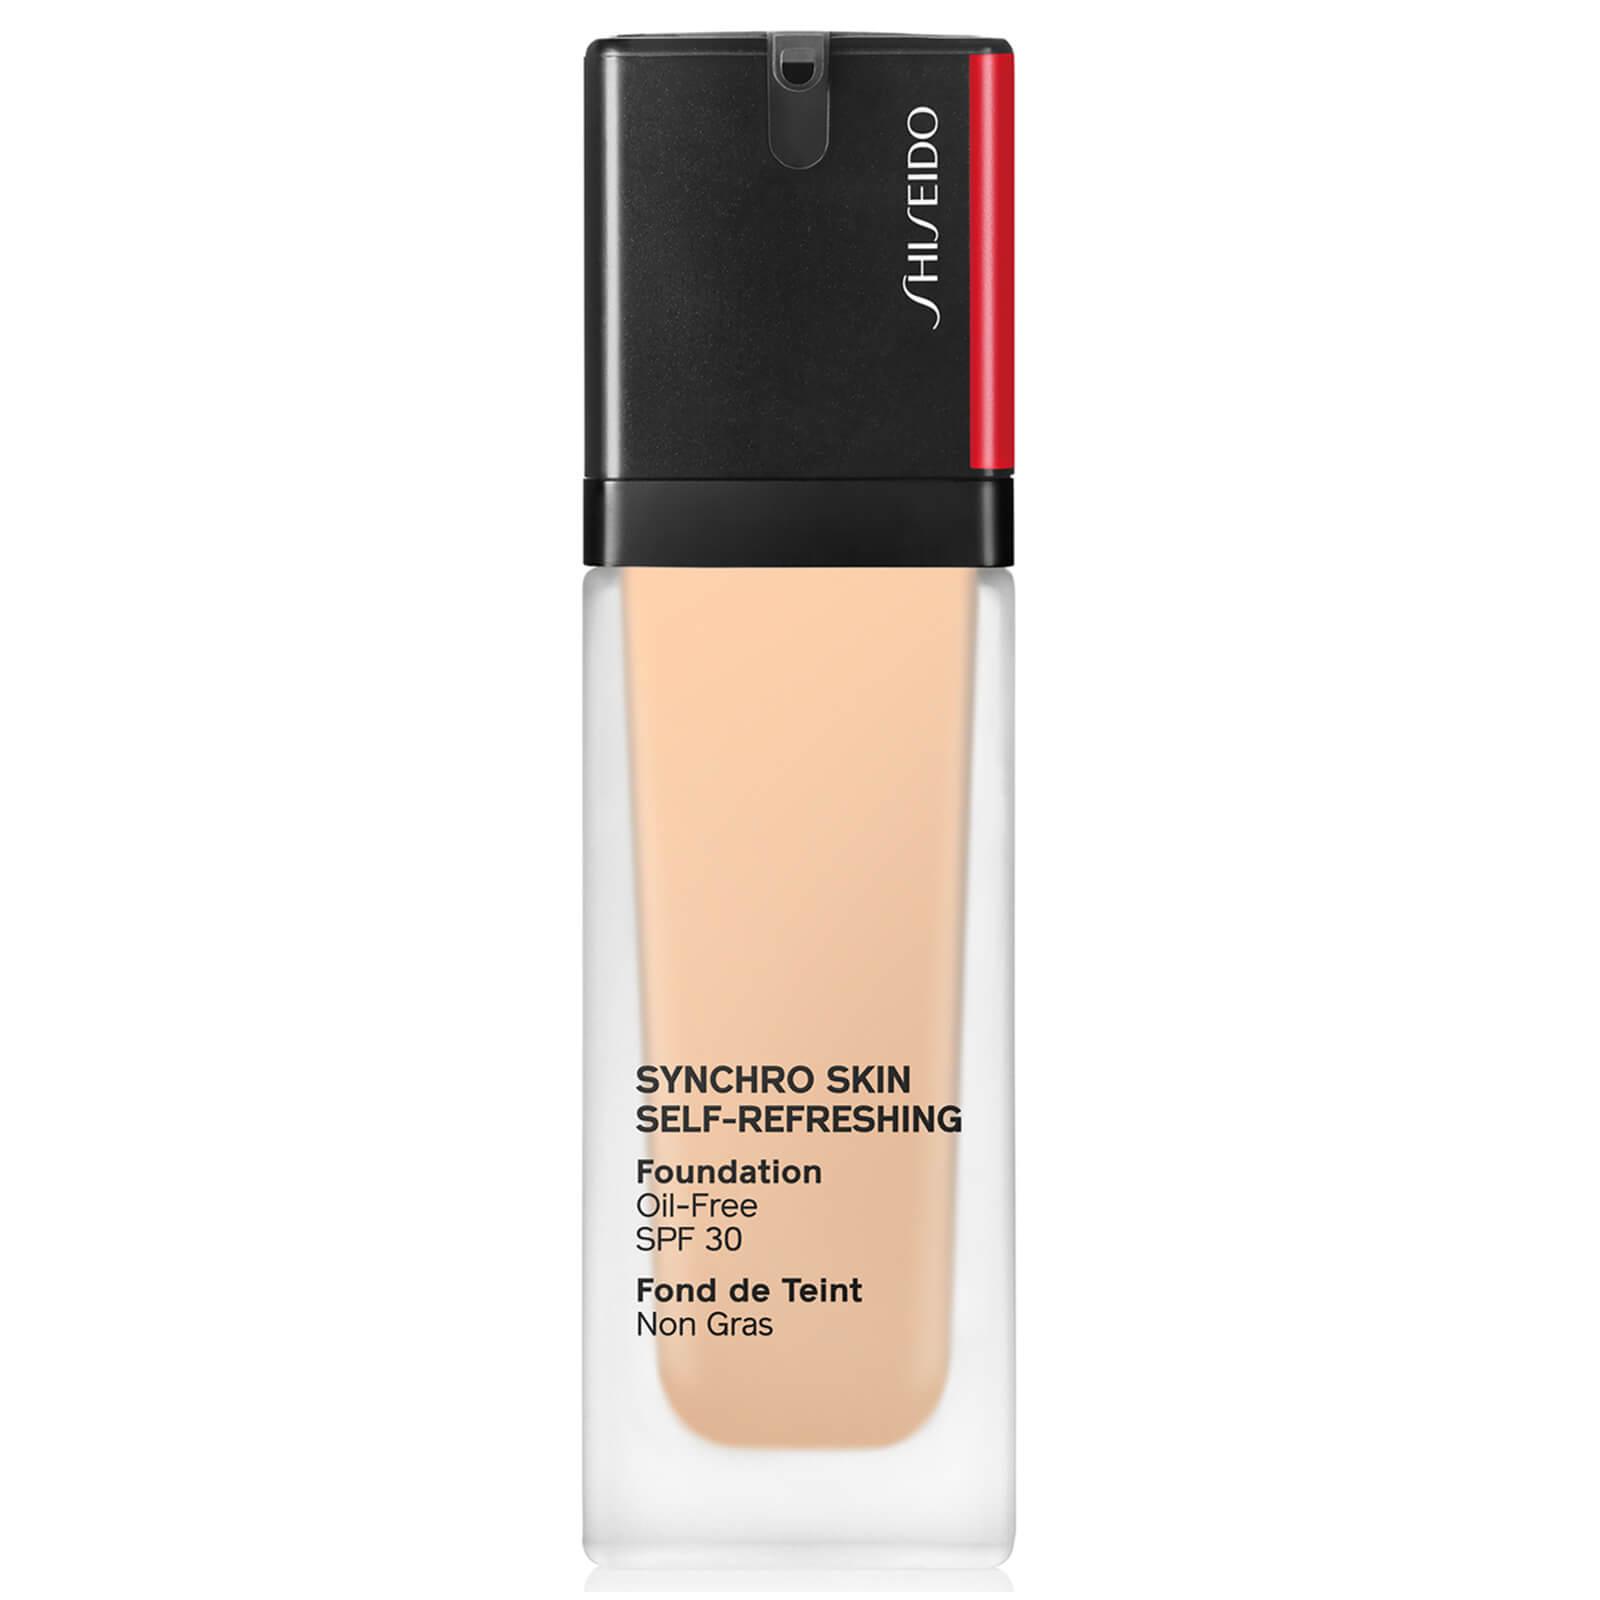 Shiseido Synchro Skin Self Refreshing Foundation 30ml (Various Shades) - 220